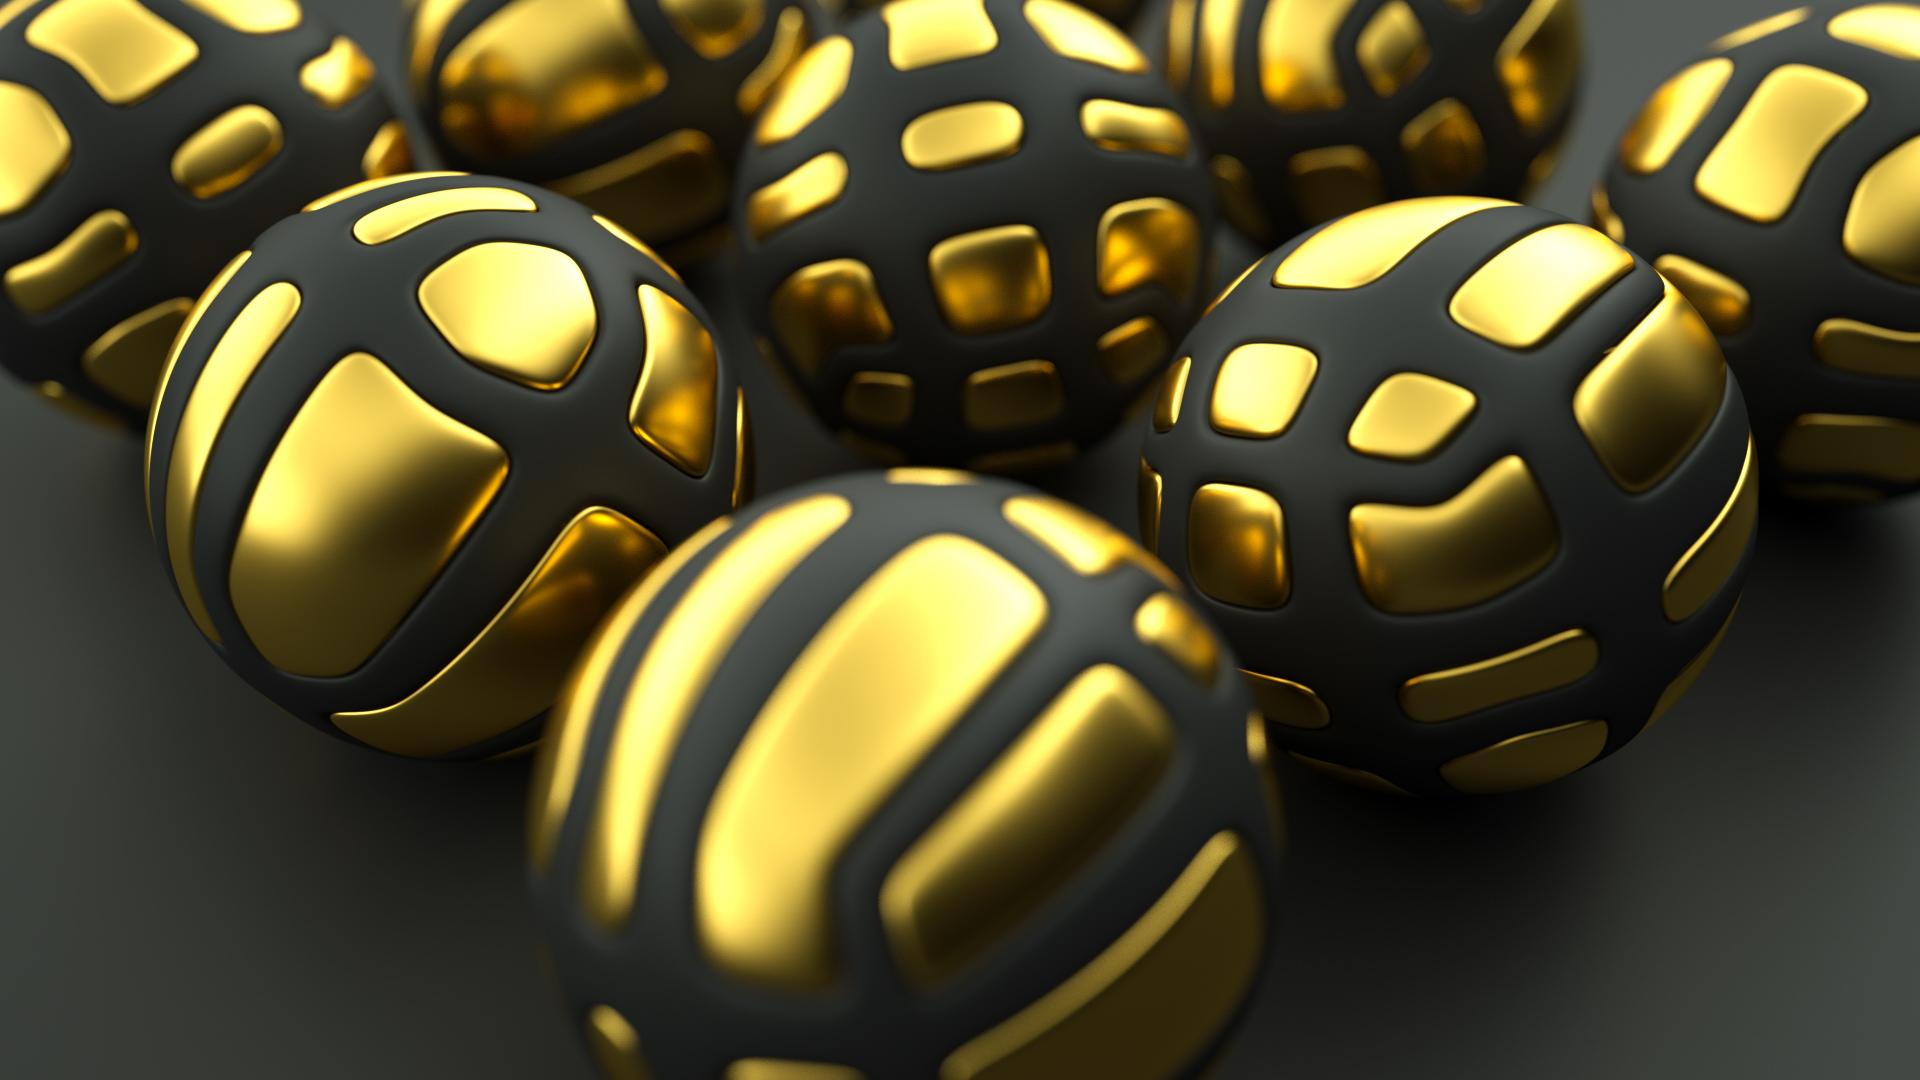 Cool 3d Wallpaper Websites Black And Gold Wallpaper Hd Pixelstalk Net